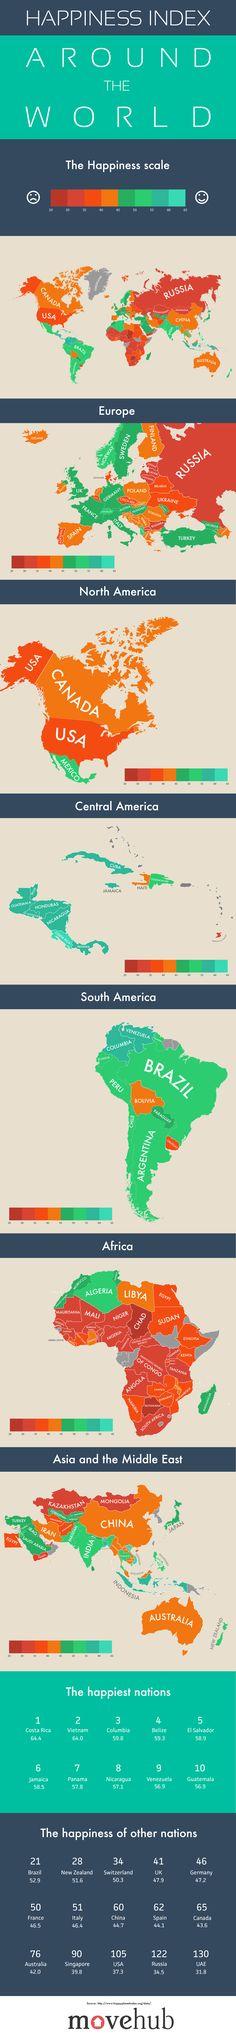 Happiness Index Around the World | Visual.ly